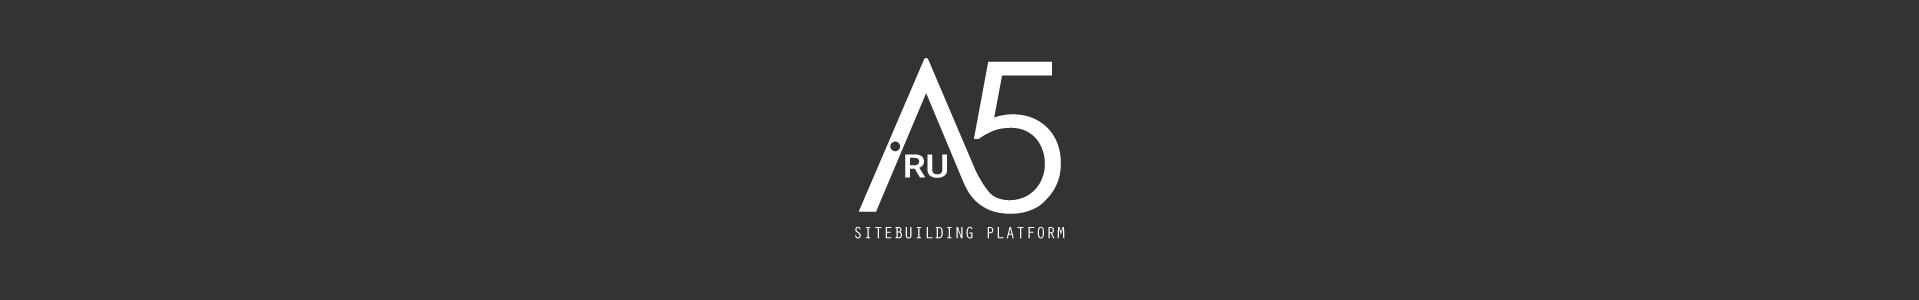 конструктор сайтов A5.ru